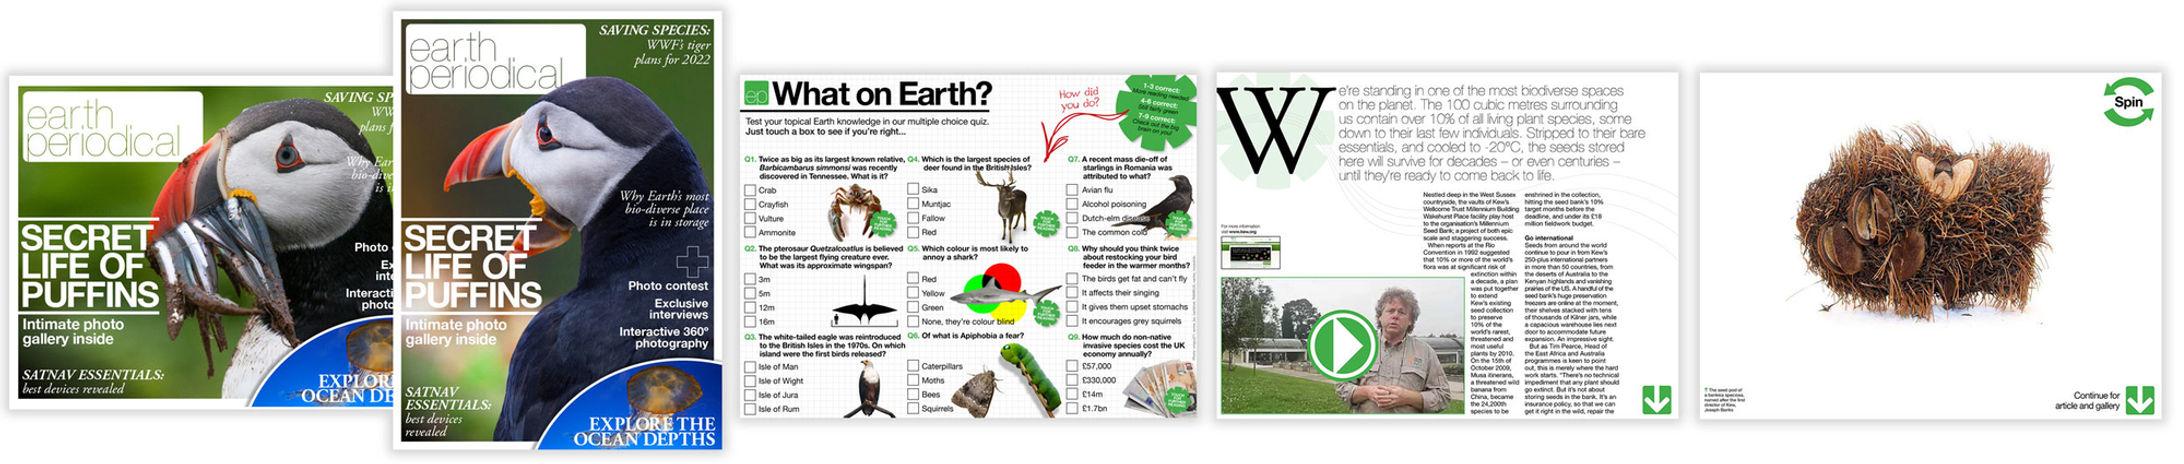 Earth-Periodical.jpg